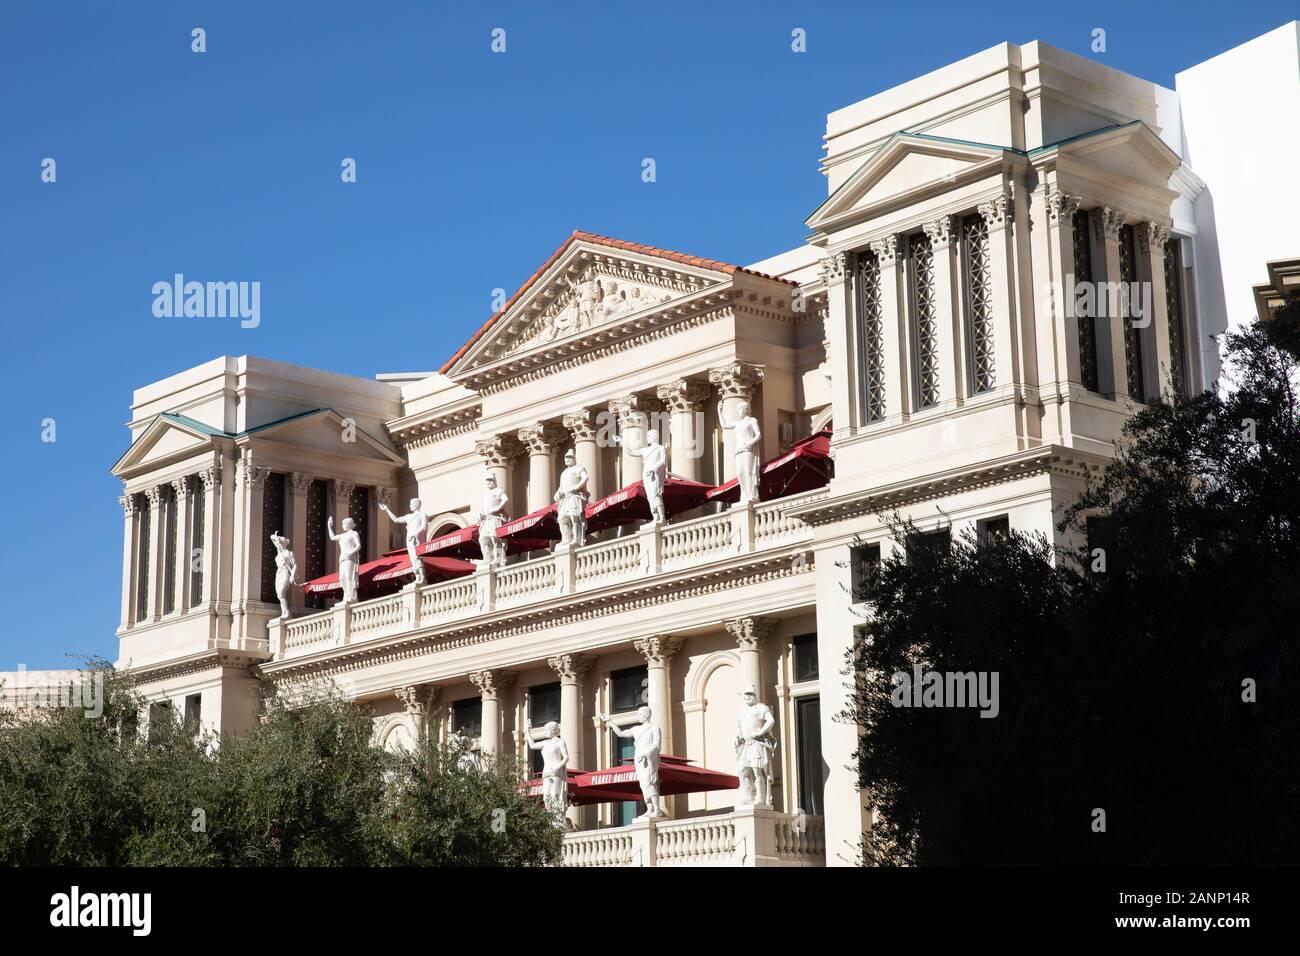 Caesers Palace Hotel in Las Vegas, Nevada, USA Stock Photo